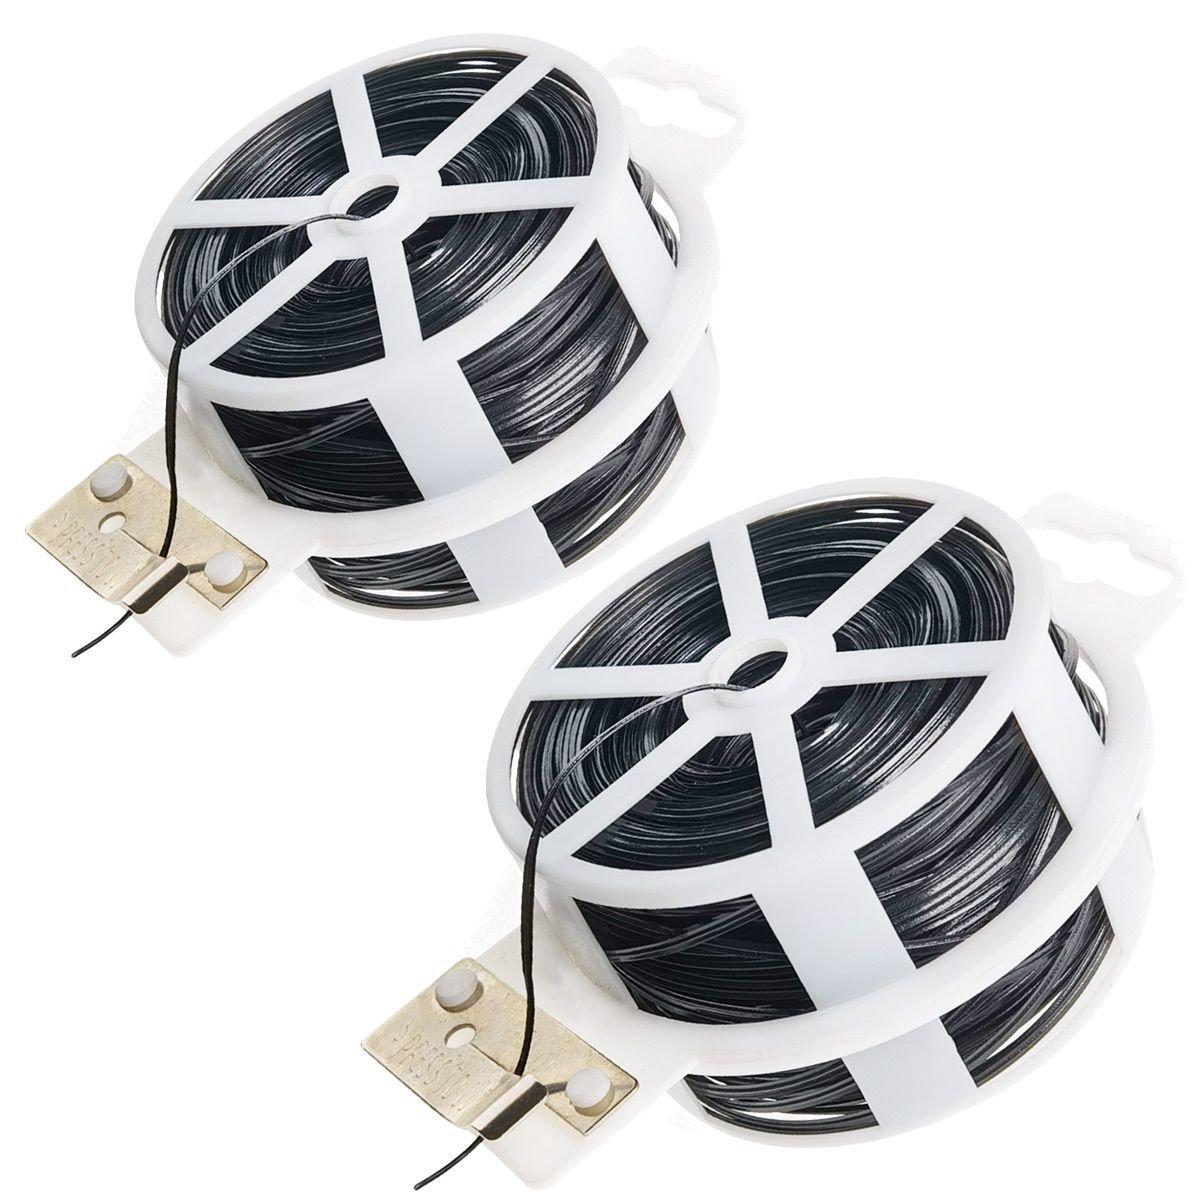 Twist-Ties-Garden-Twisty-Ties-Black-200M-656-Feet